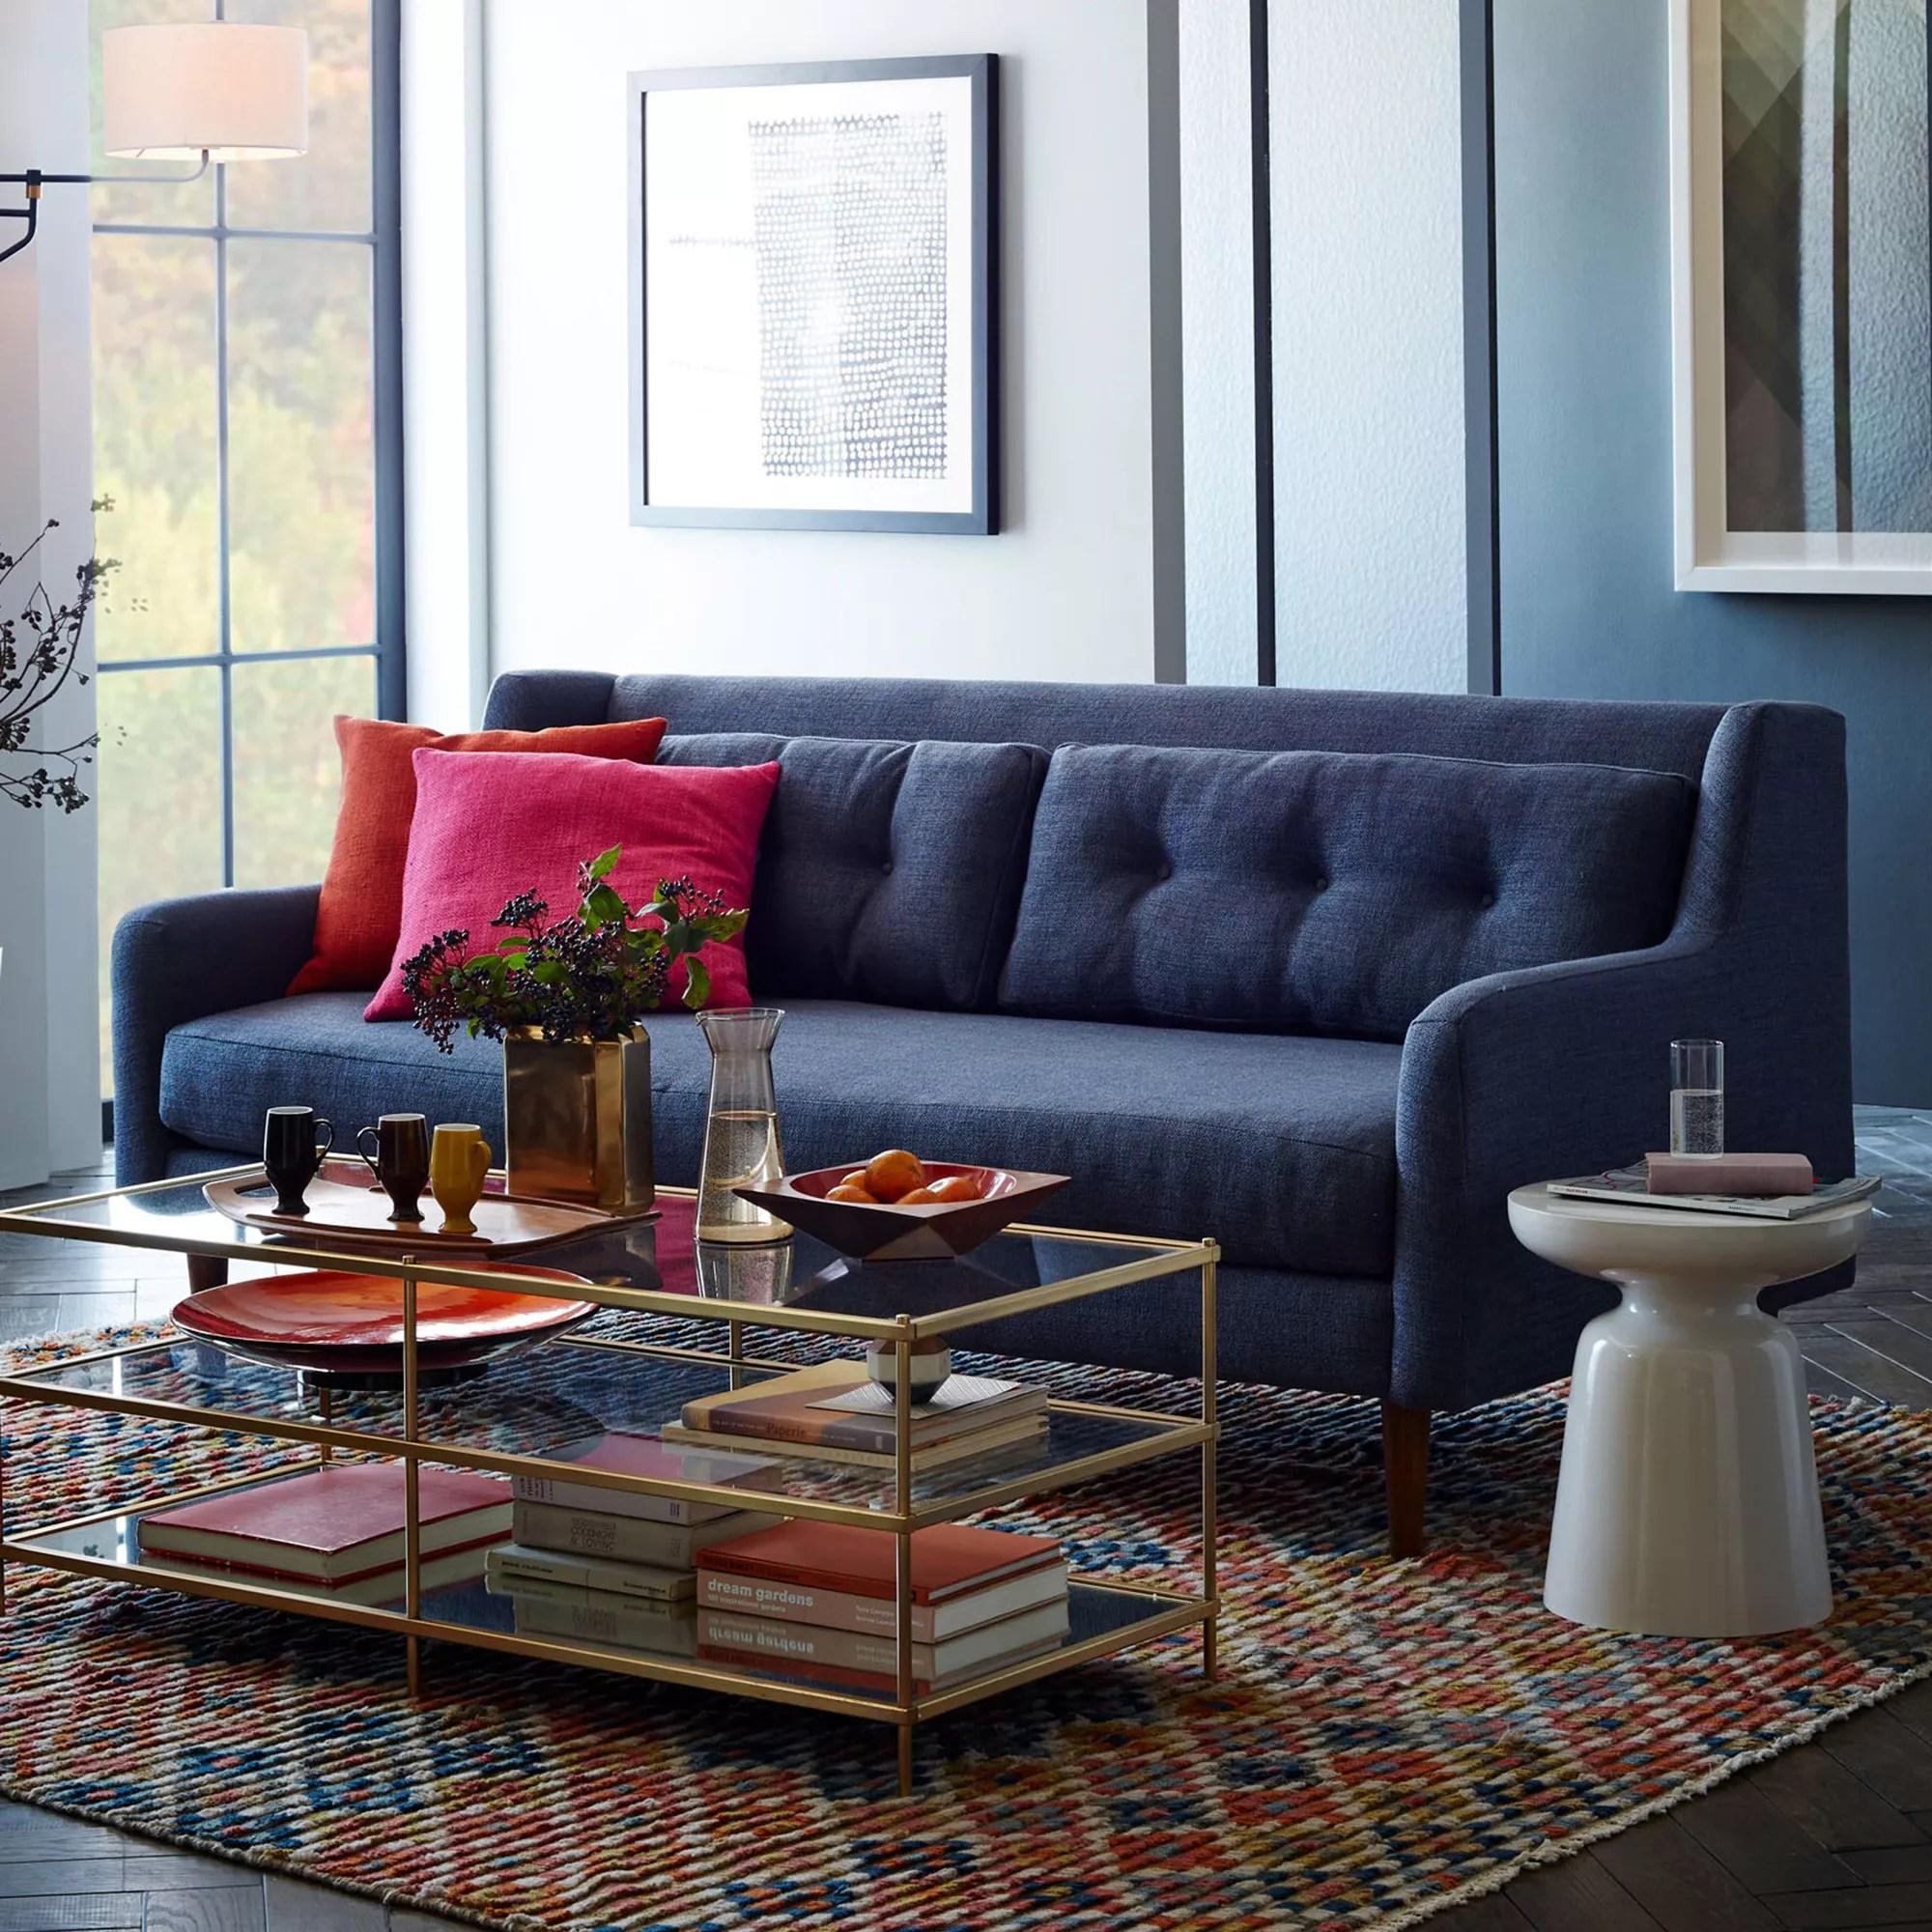 west elm crosby chair la z boy lift hand control 3 seater sofa aegean blue at john lewis